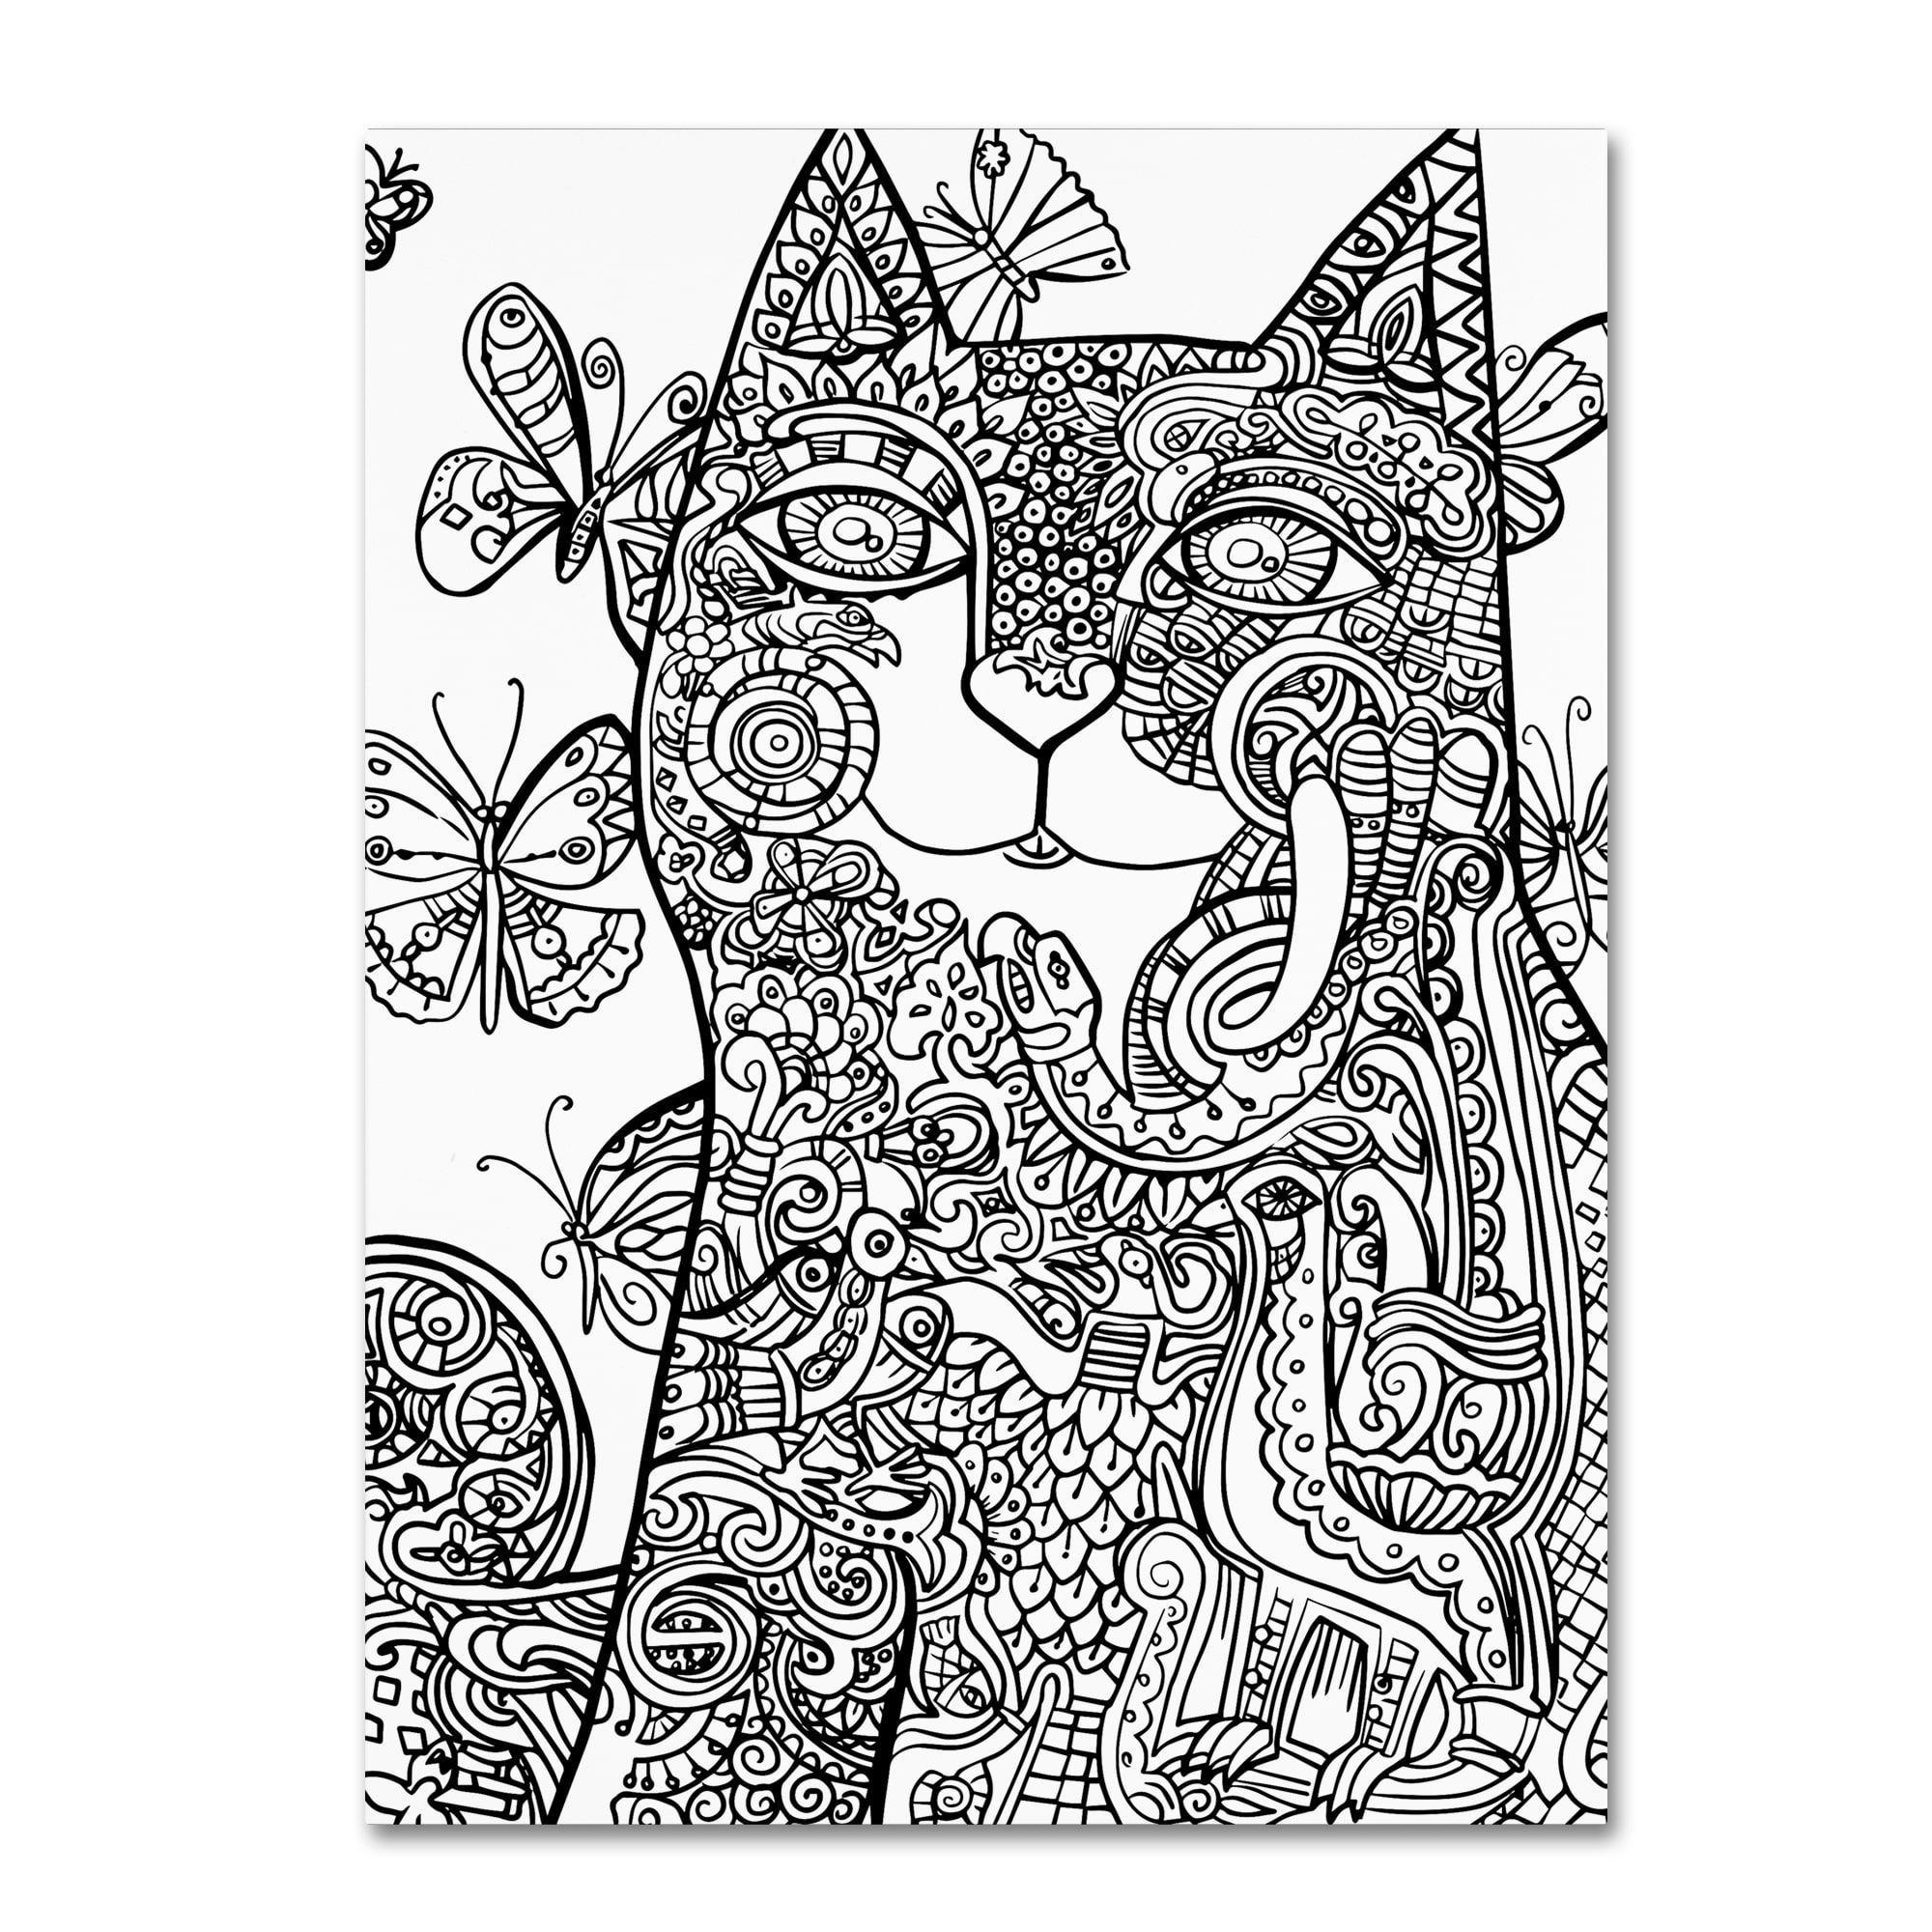 Oxana ziaka uireland cat u canvas art products pinterest